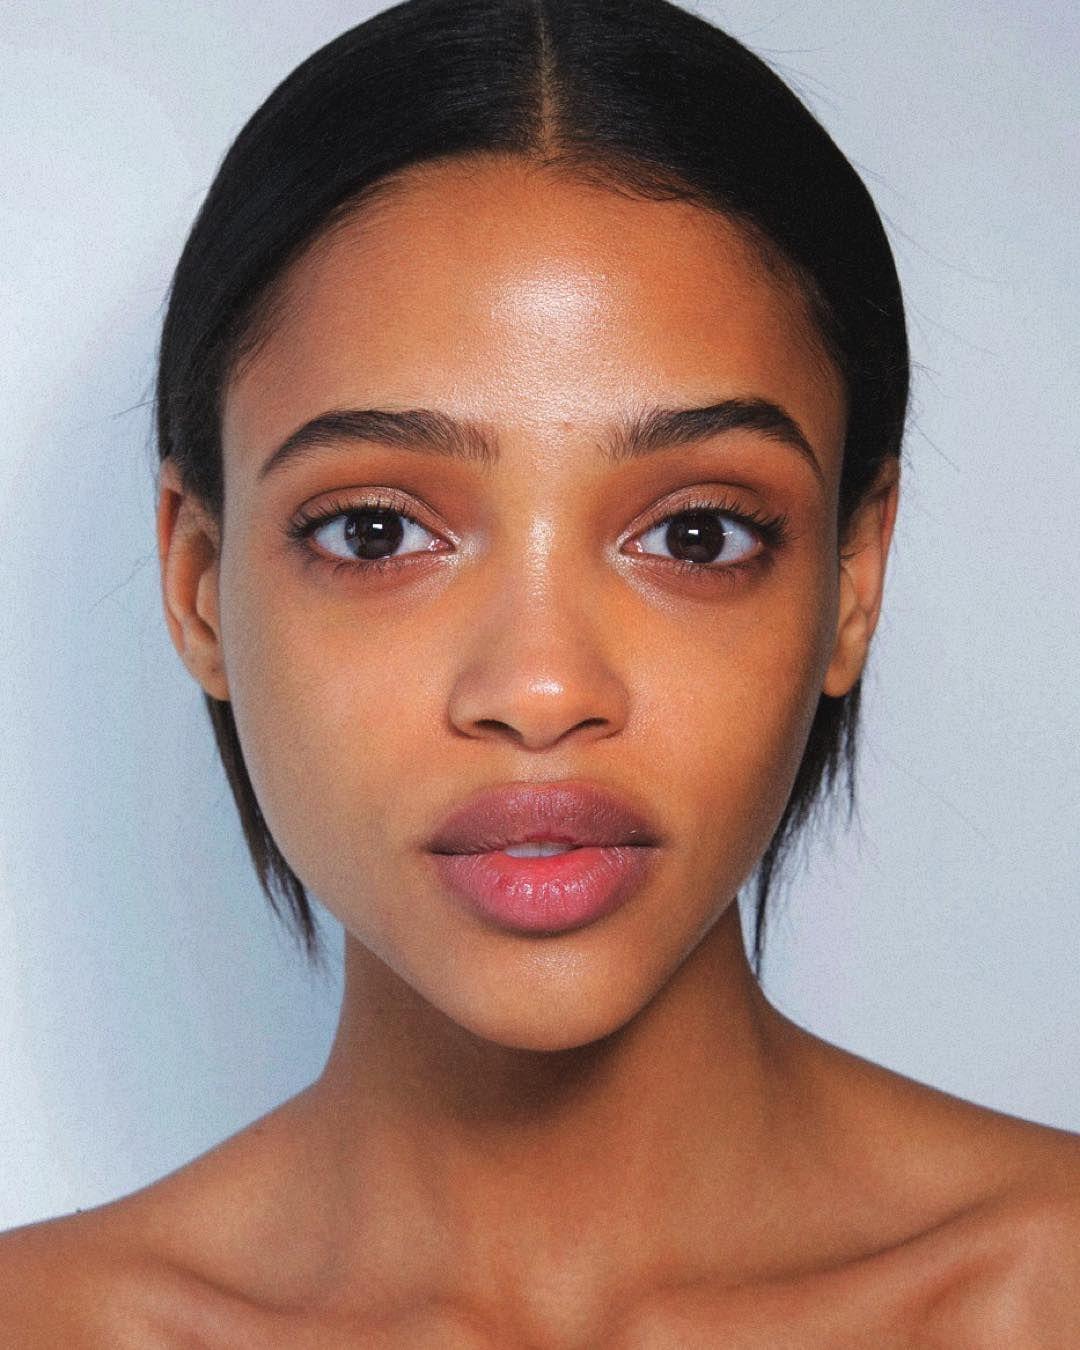 pinterest sallysein_ Olive skin makeup, Wedding makeup